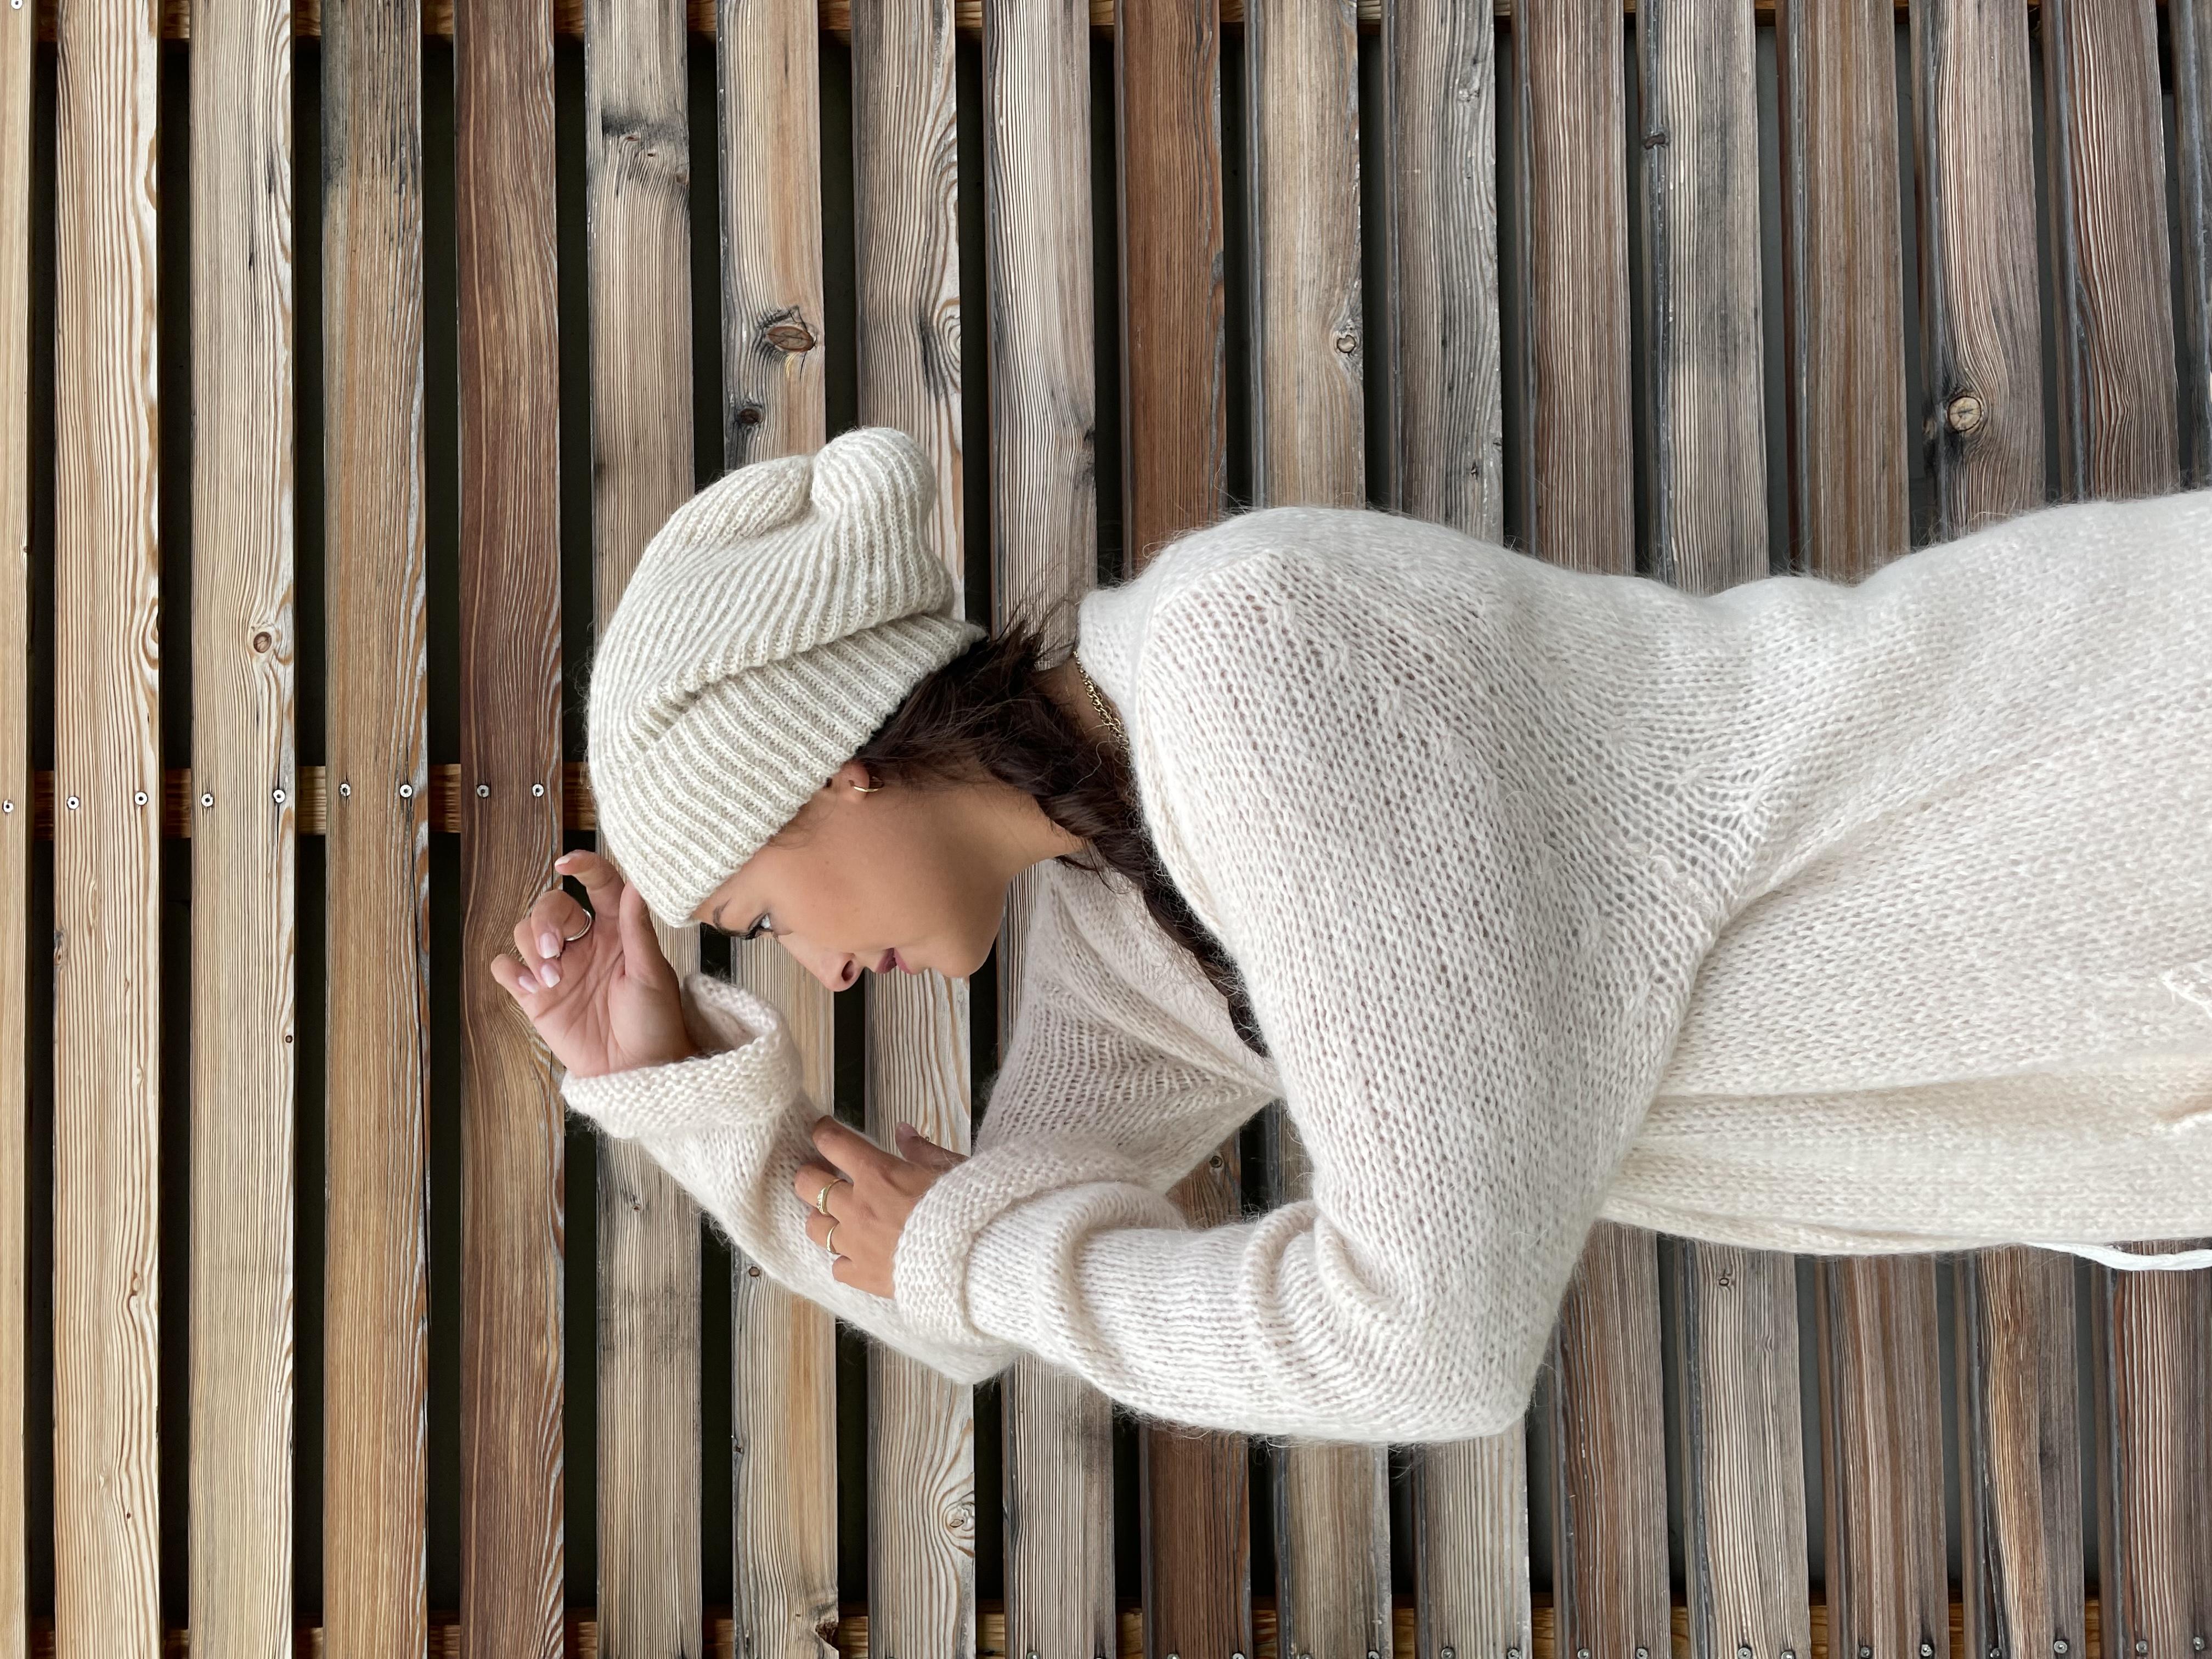 Mütze muffy mohair - Bypias